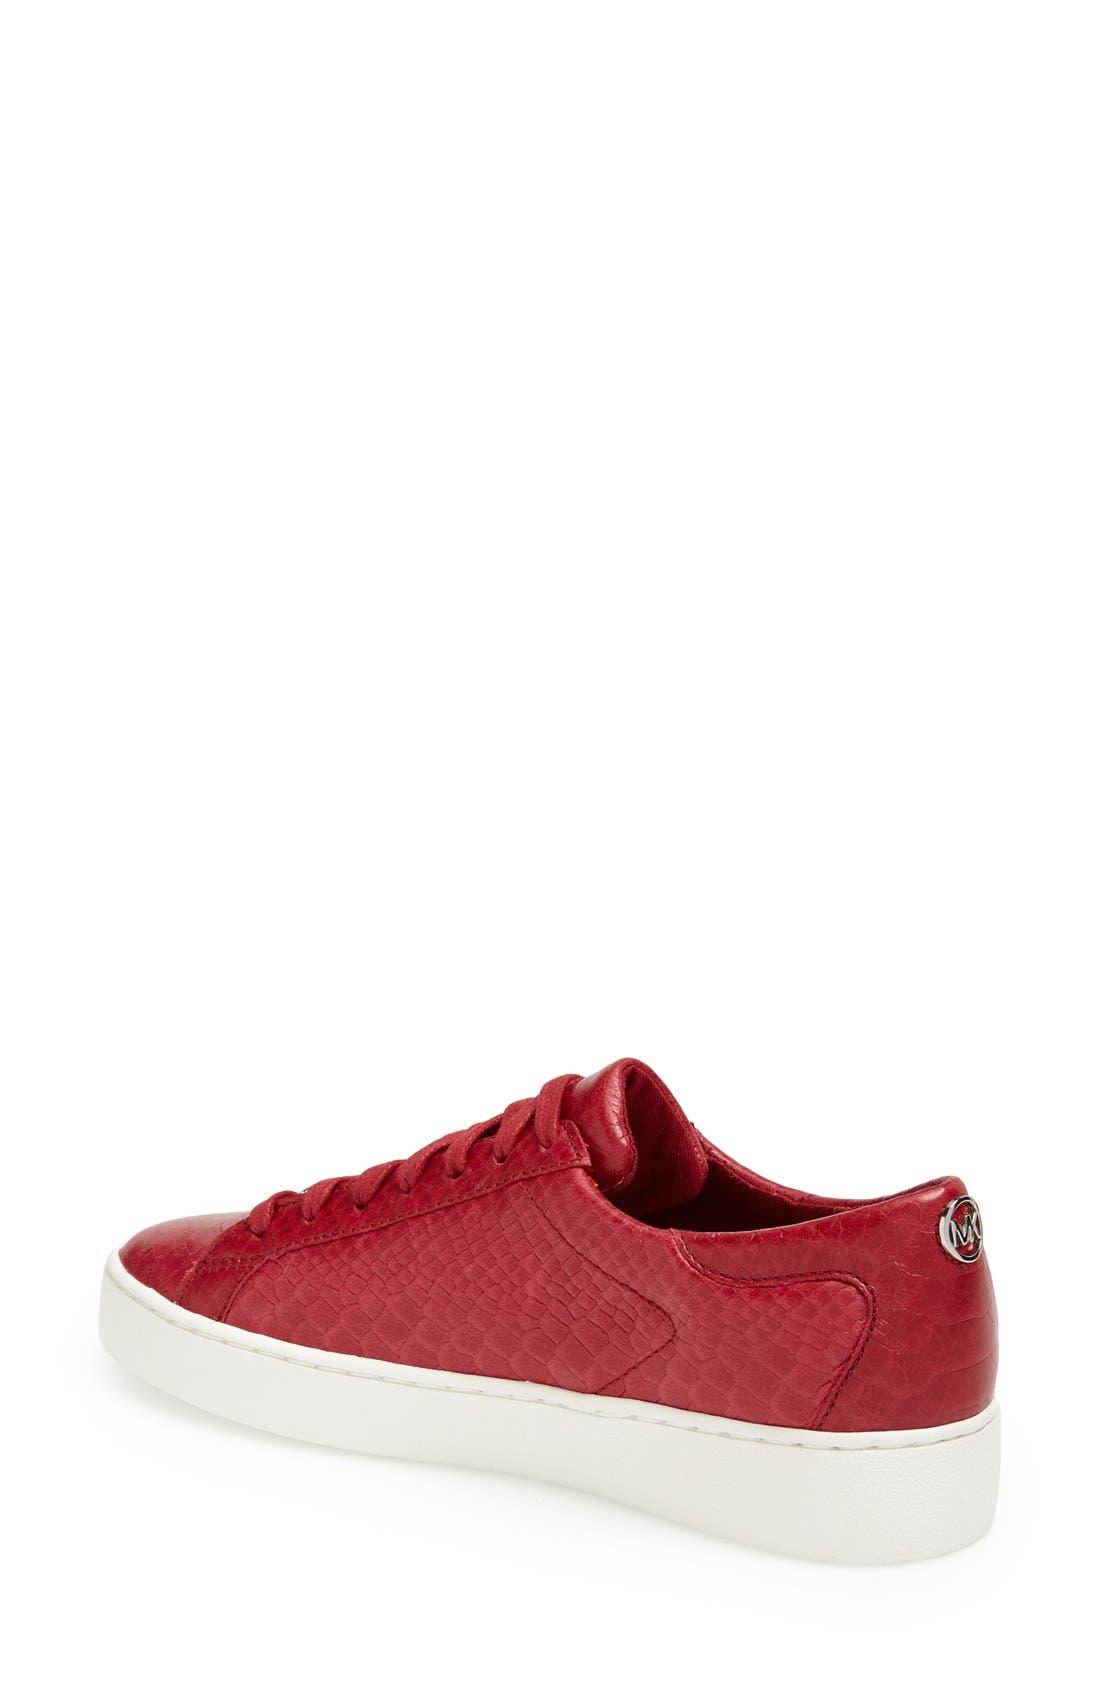 'Keaton' Sneaker,                             Alternate thumbnail 24, color,